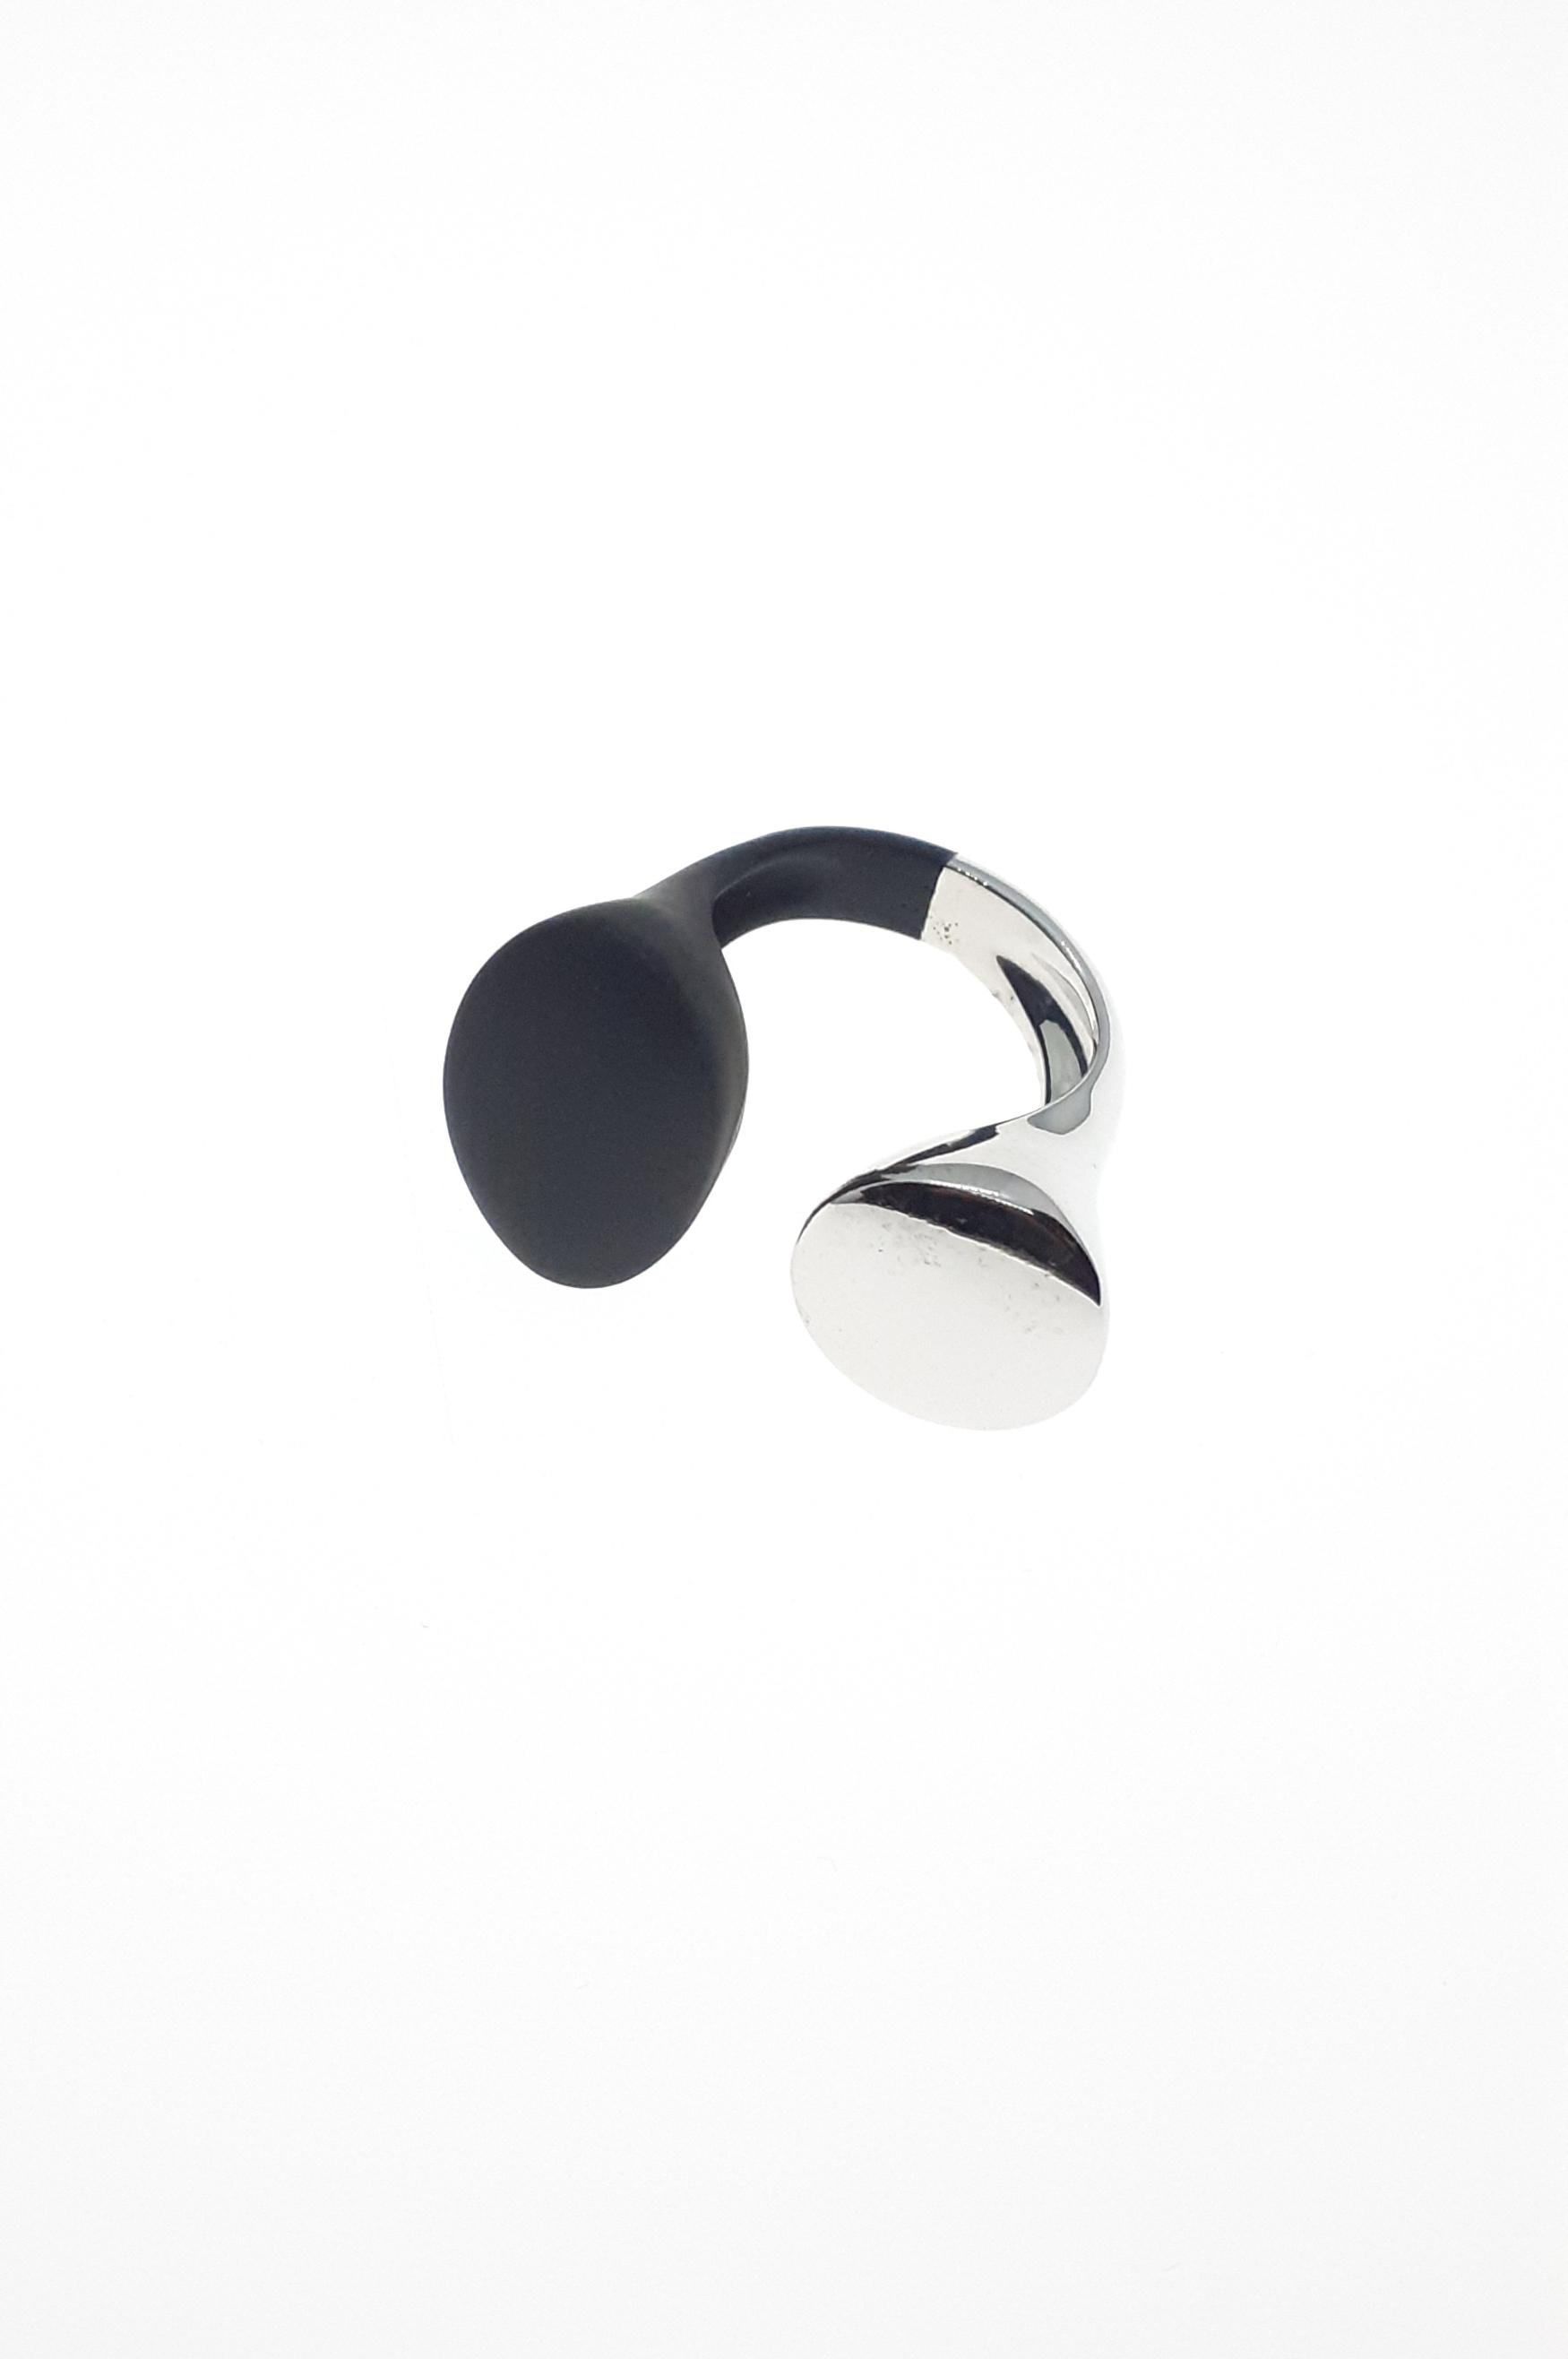 Sensi joyas jewellery Granada silver engagementSILVER AND RUBBER RING